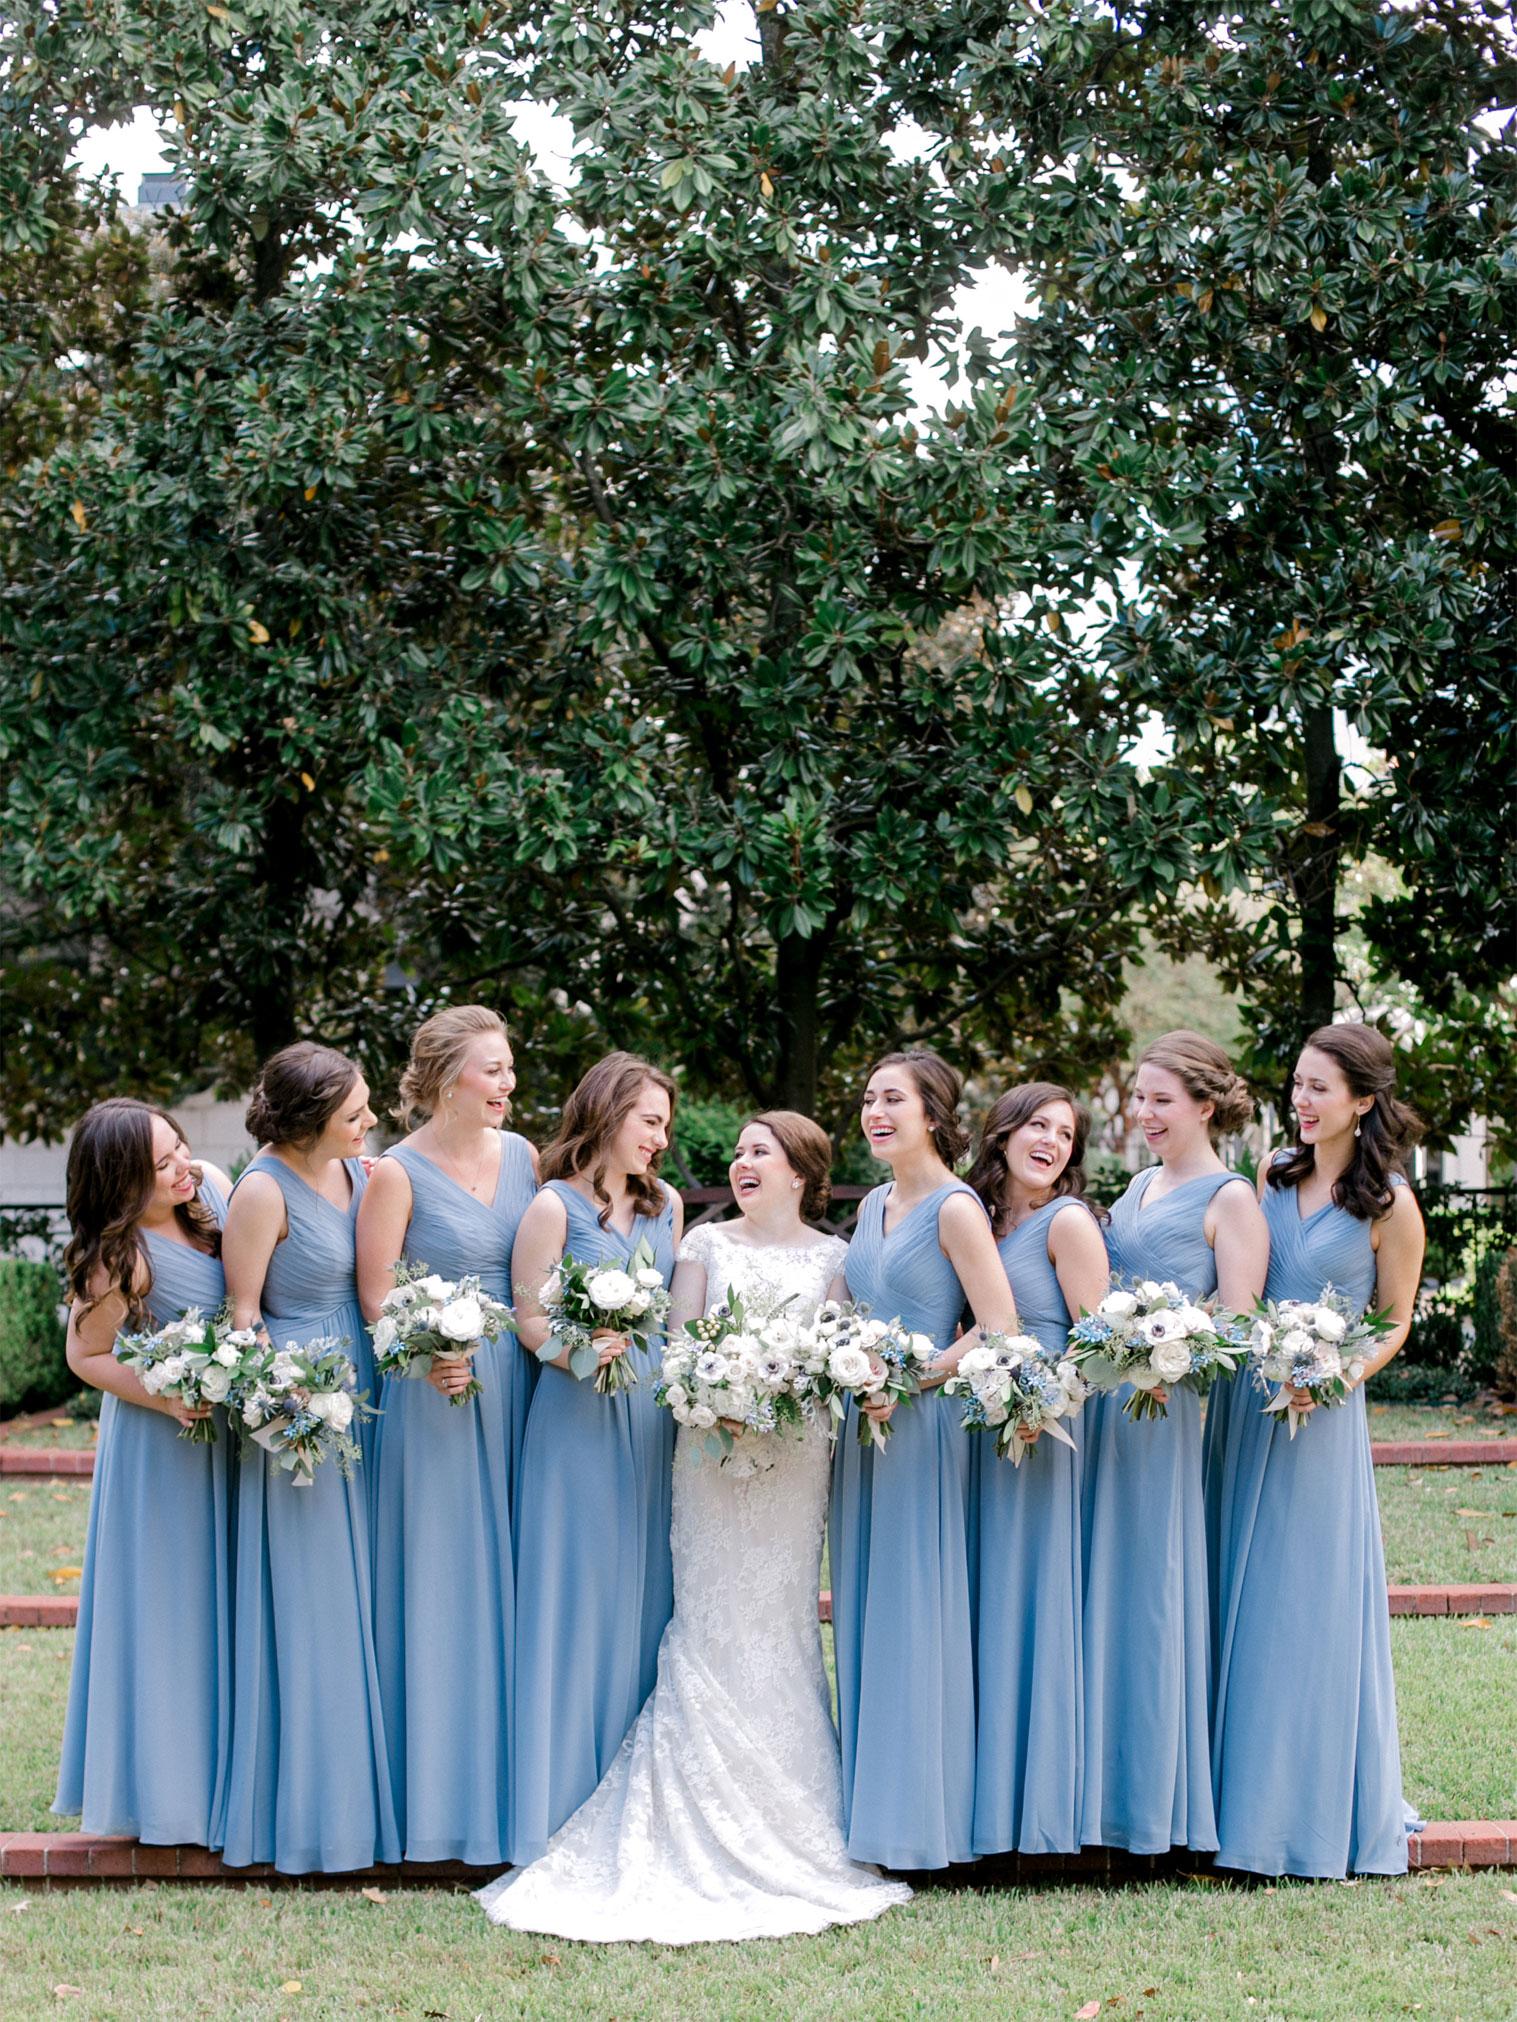 Susannah-Zach-Wedding-0121.jpg